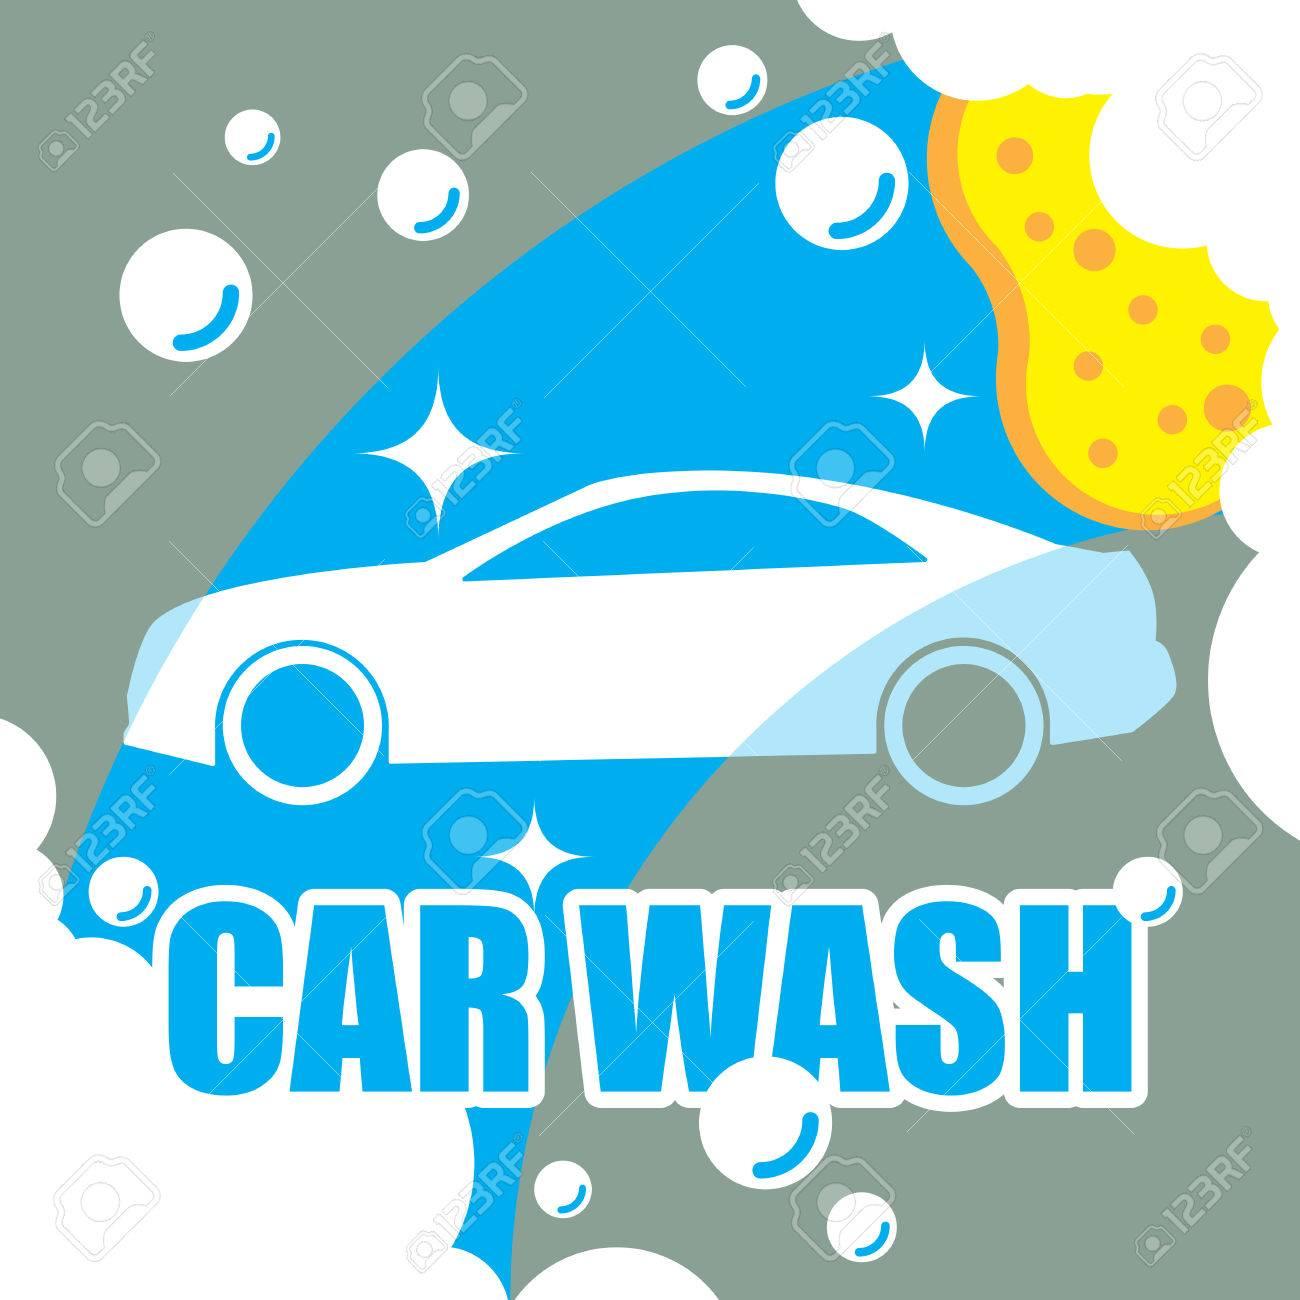 images?q=tbn:ANd9GcQh_l3eQ5xwiPy07kGEXjmjgmBKBRB7H2mRxCGhv1tFWg5c_mWT Ideas For Car Wash Vector Art @koolgadgetz.com.info